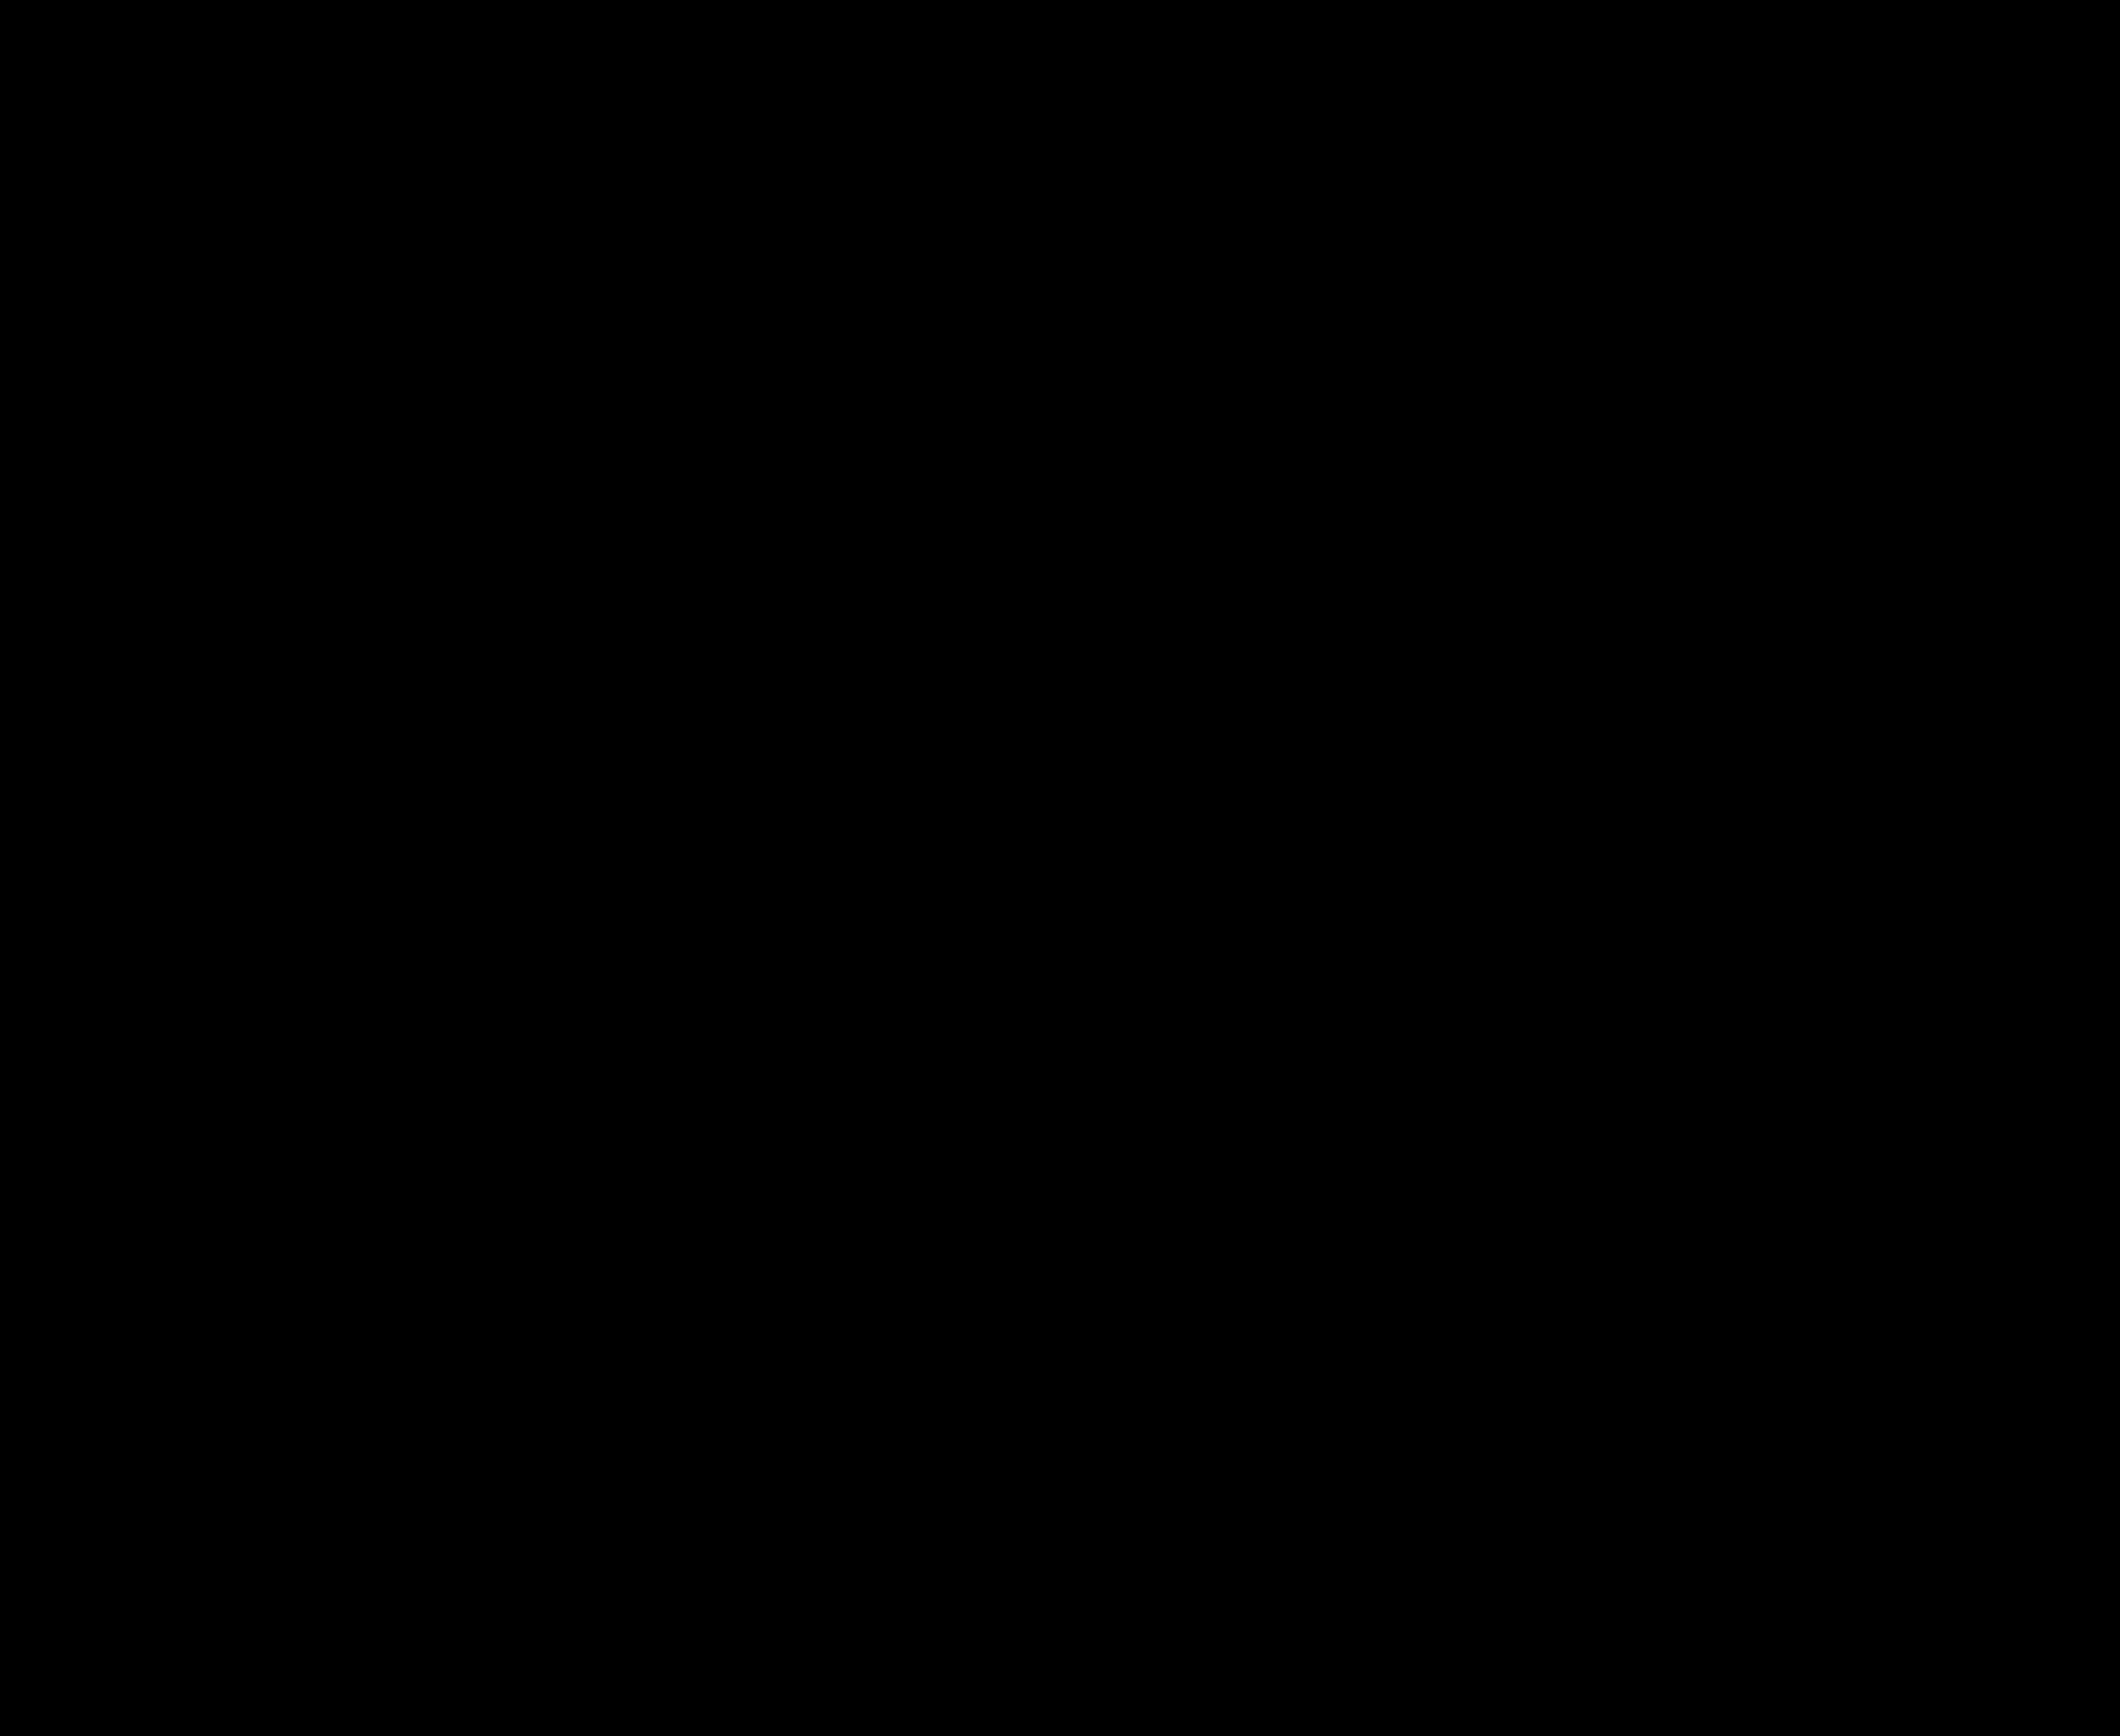 http://www.avasa.it/logo%20no%20bckgrnd.png